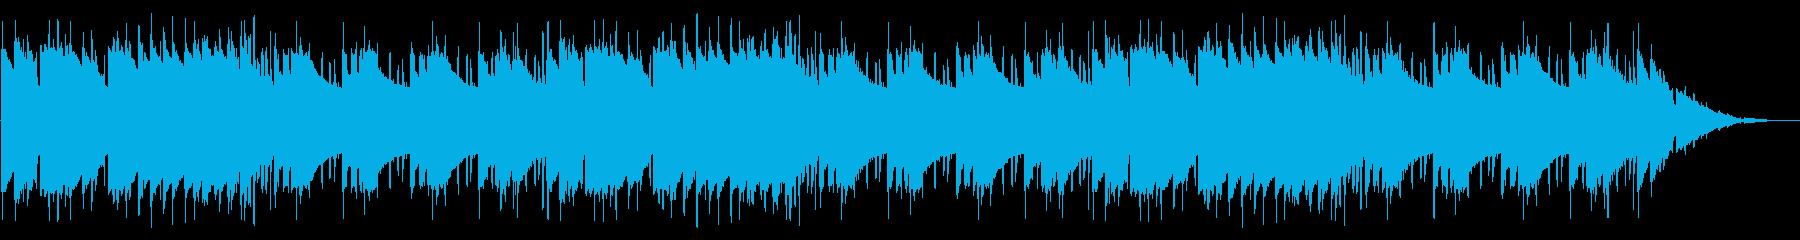 GB風スポーツゲームのエンディング曲の再生済みの波形